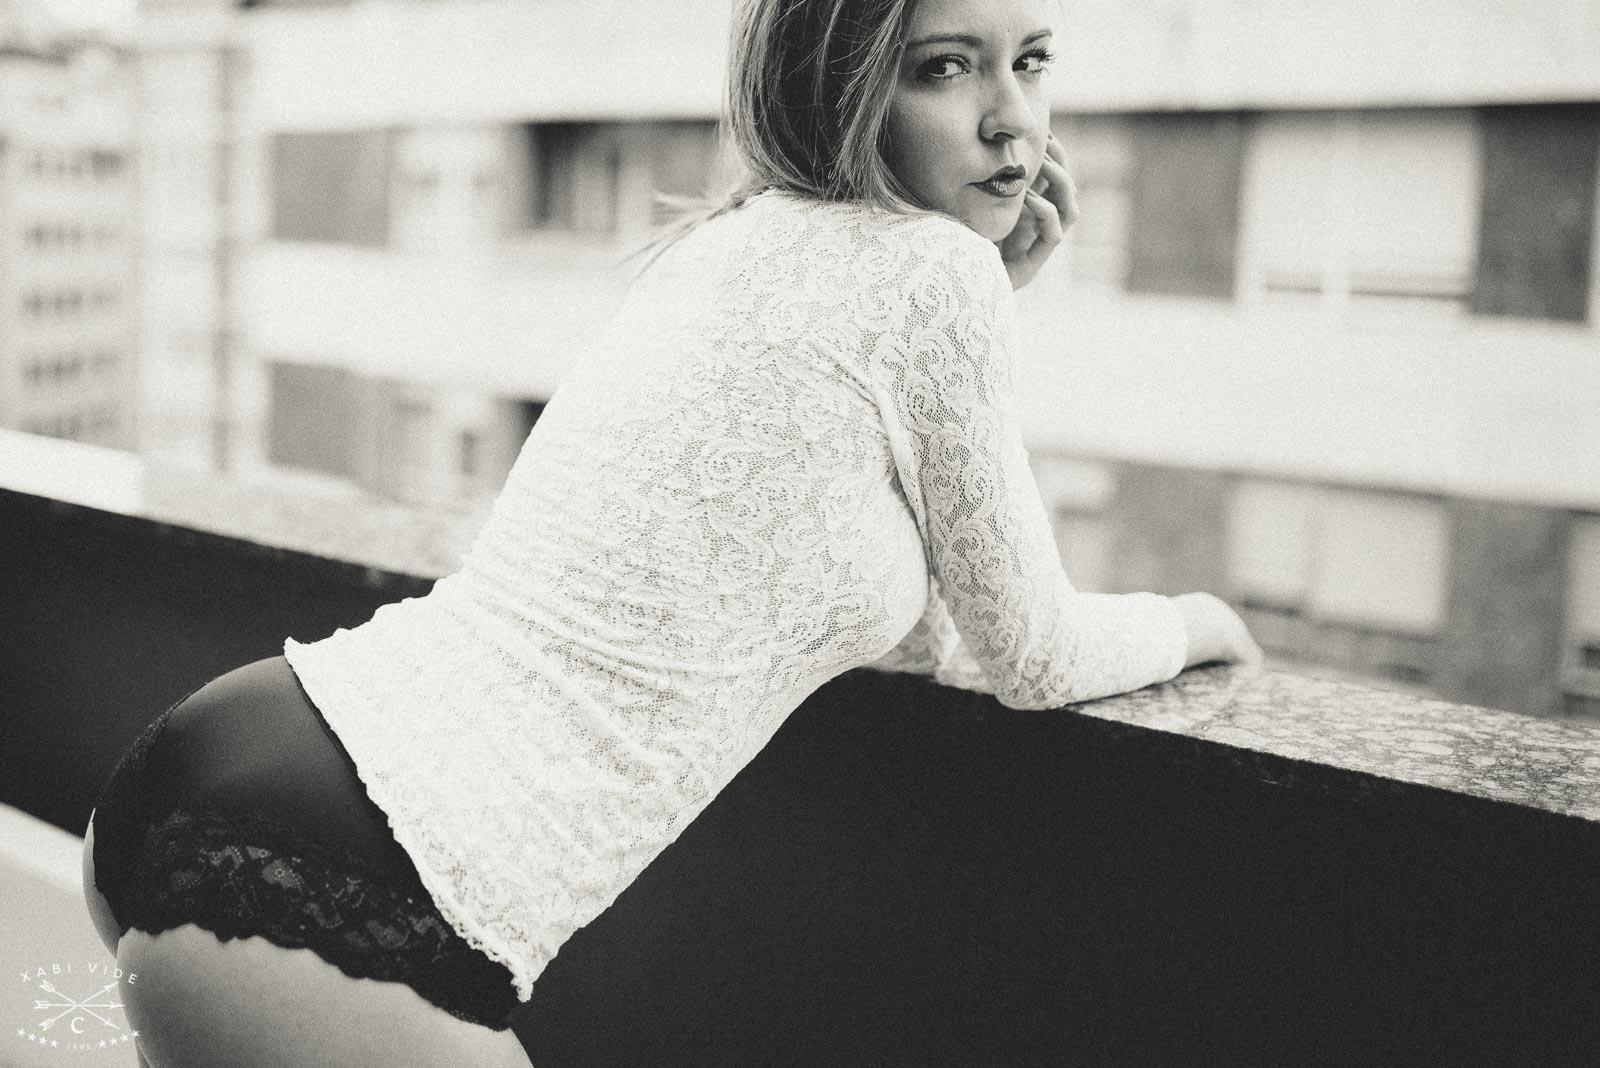 natalia_boudoir_xabivide-36